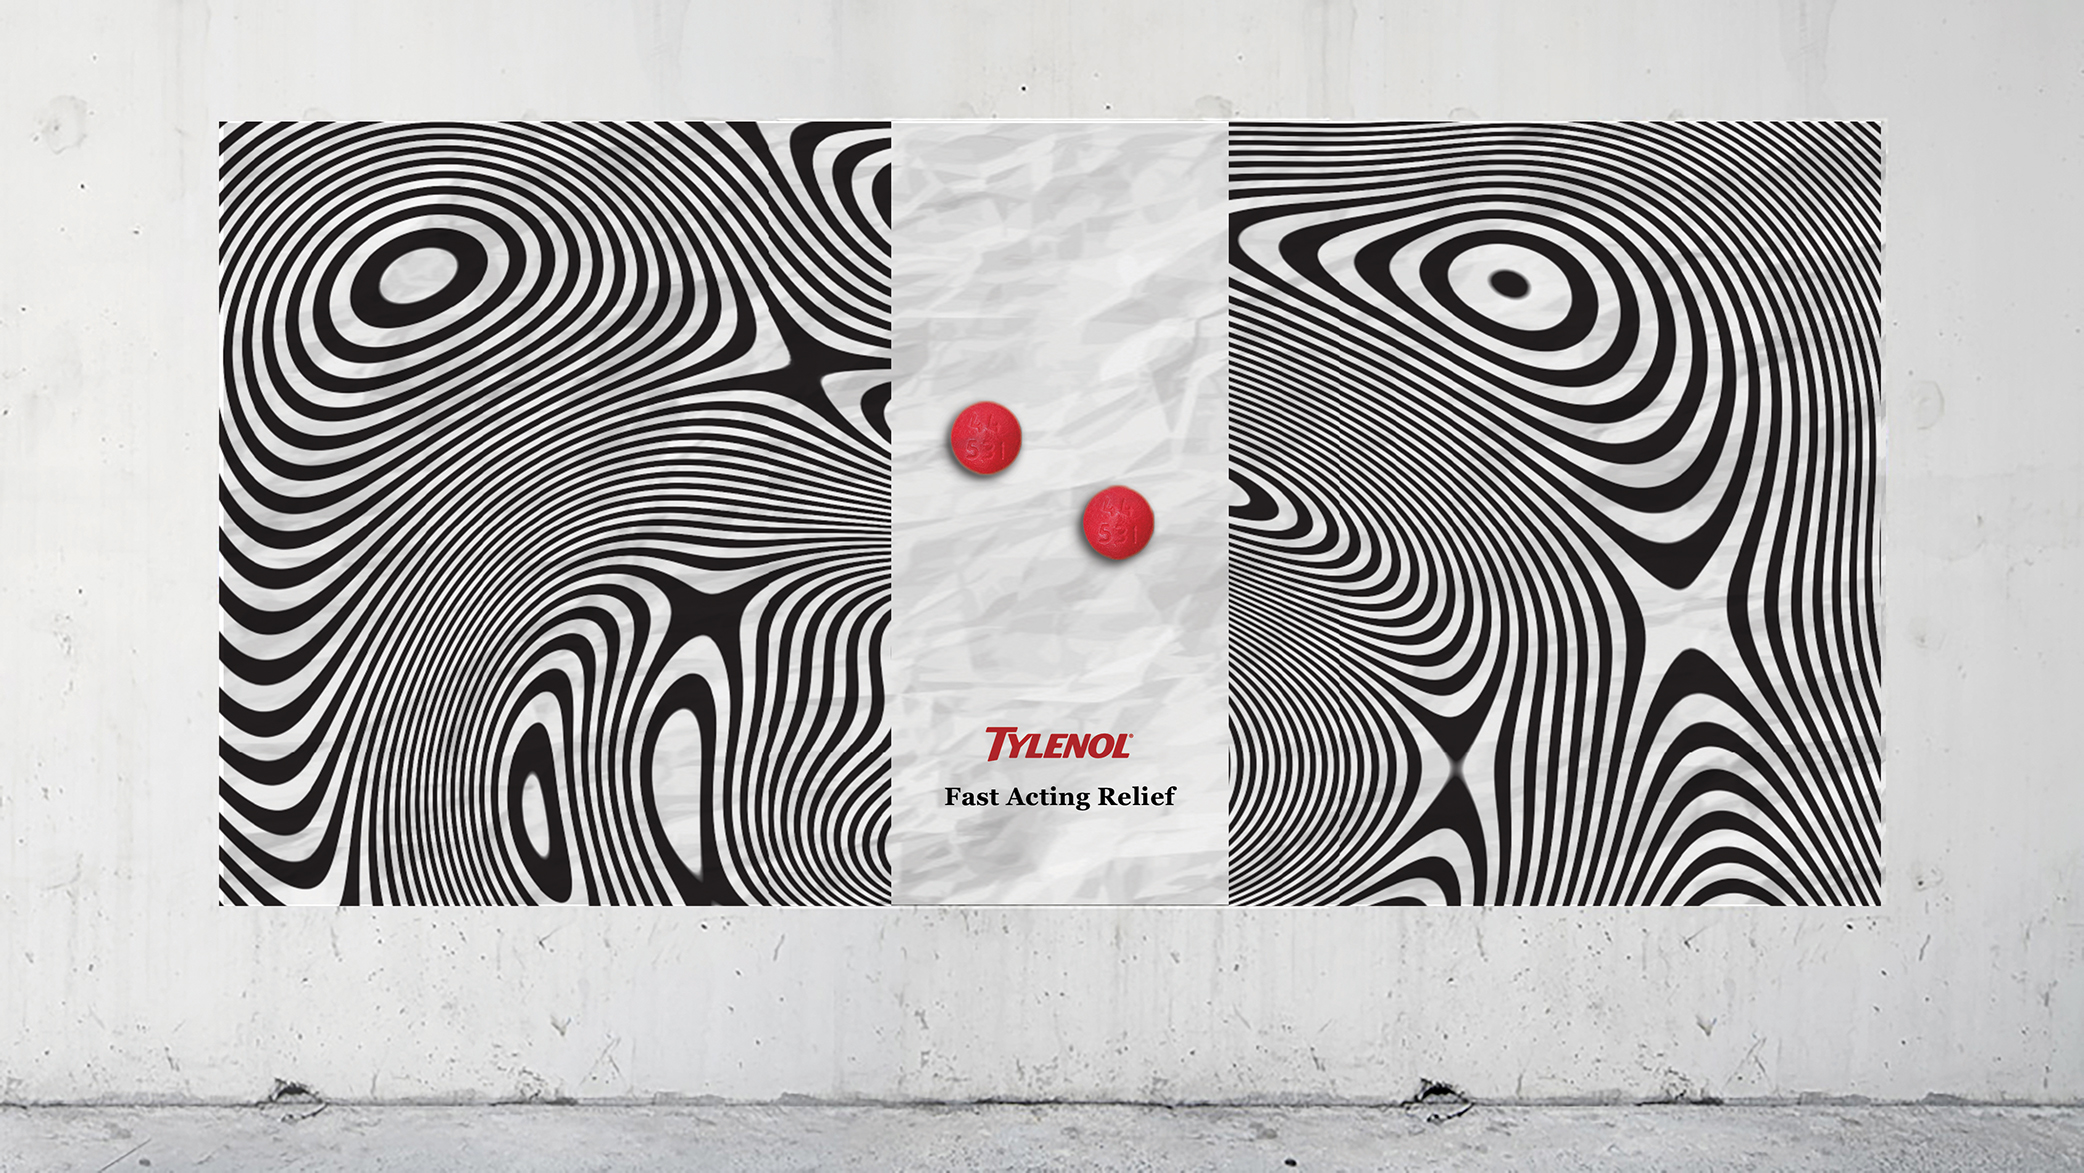 Tylenol_OOH_Poster_Series.png